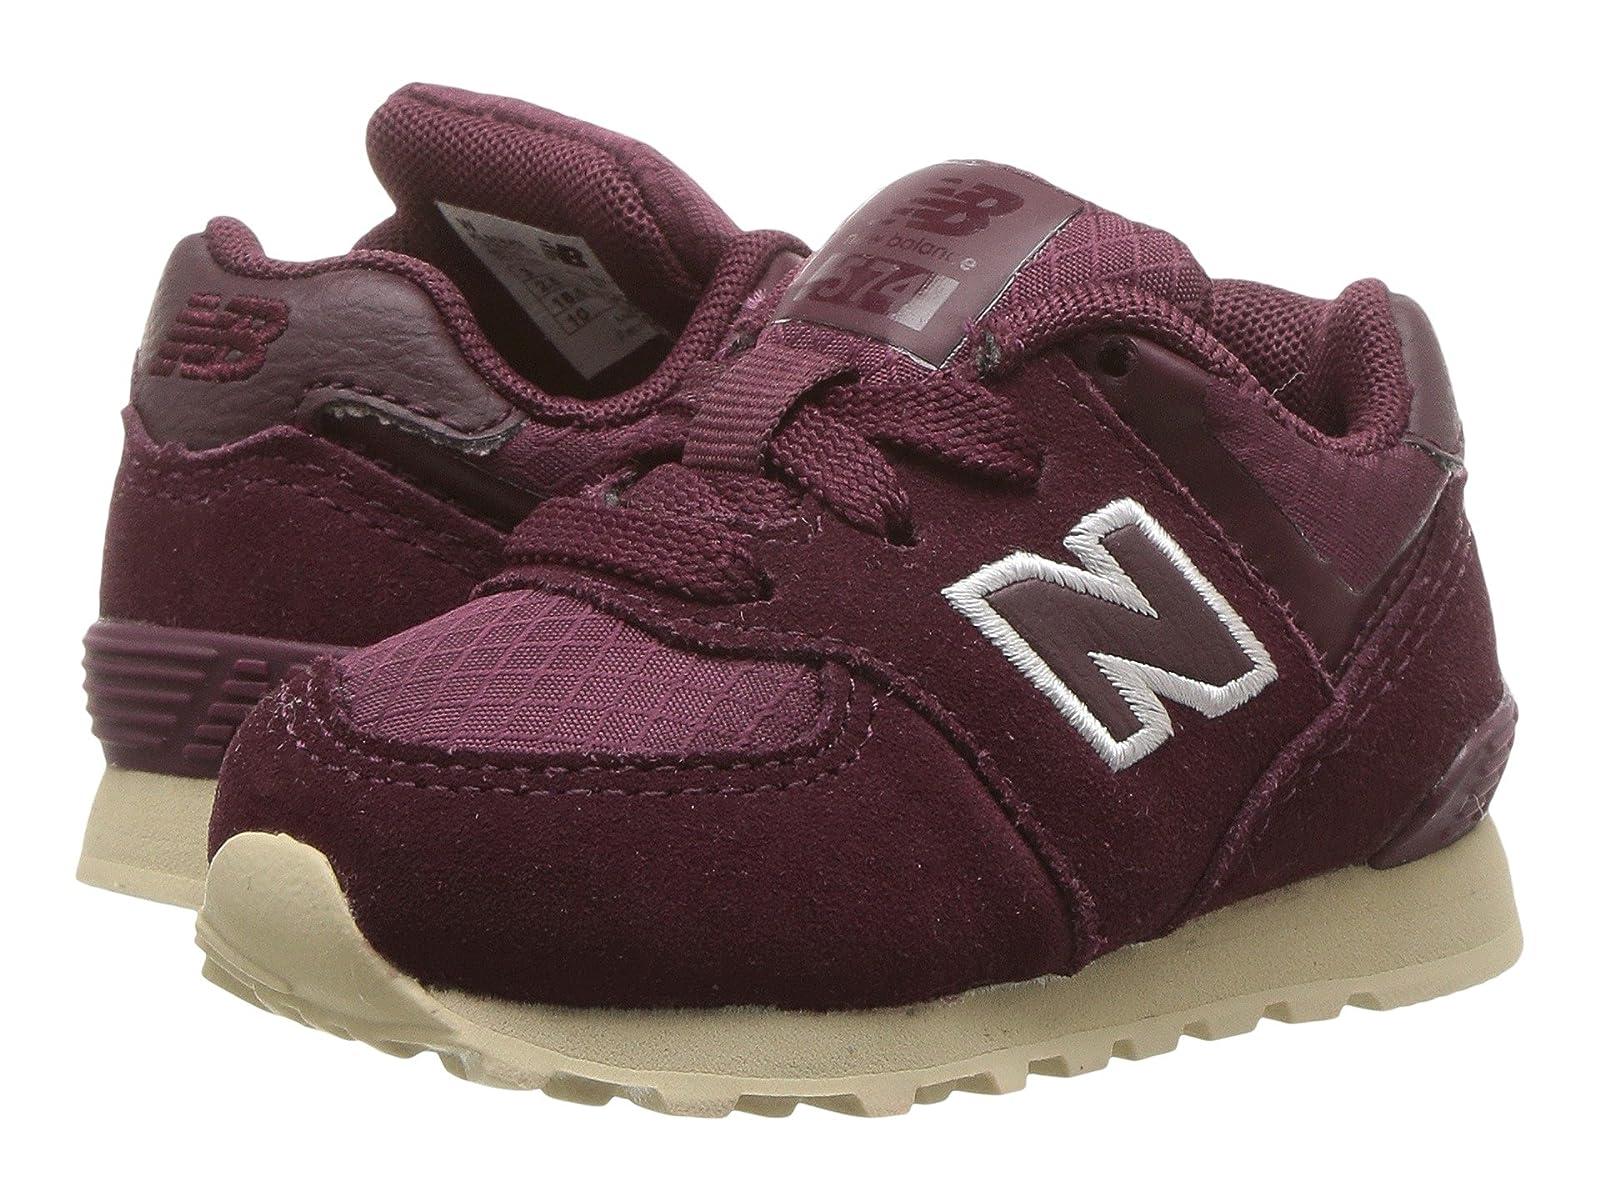 New Balance Kids KL574v1I (Infant/Toddler)Cheap and distinctive eye-catching shoes